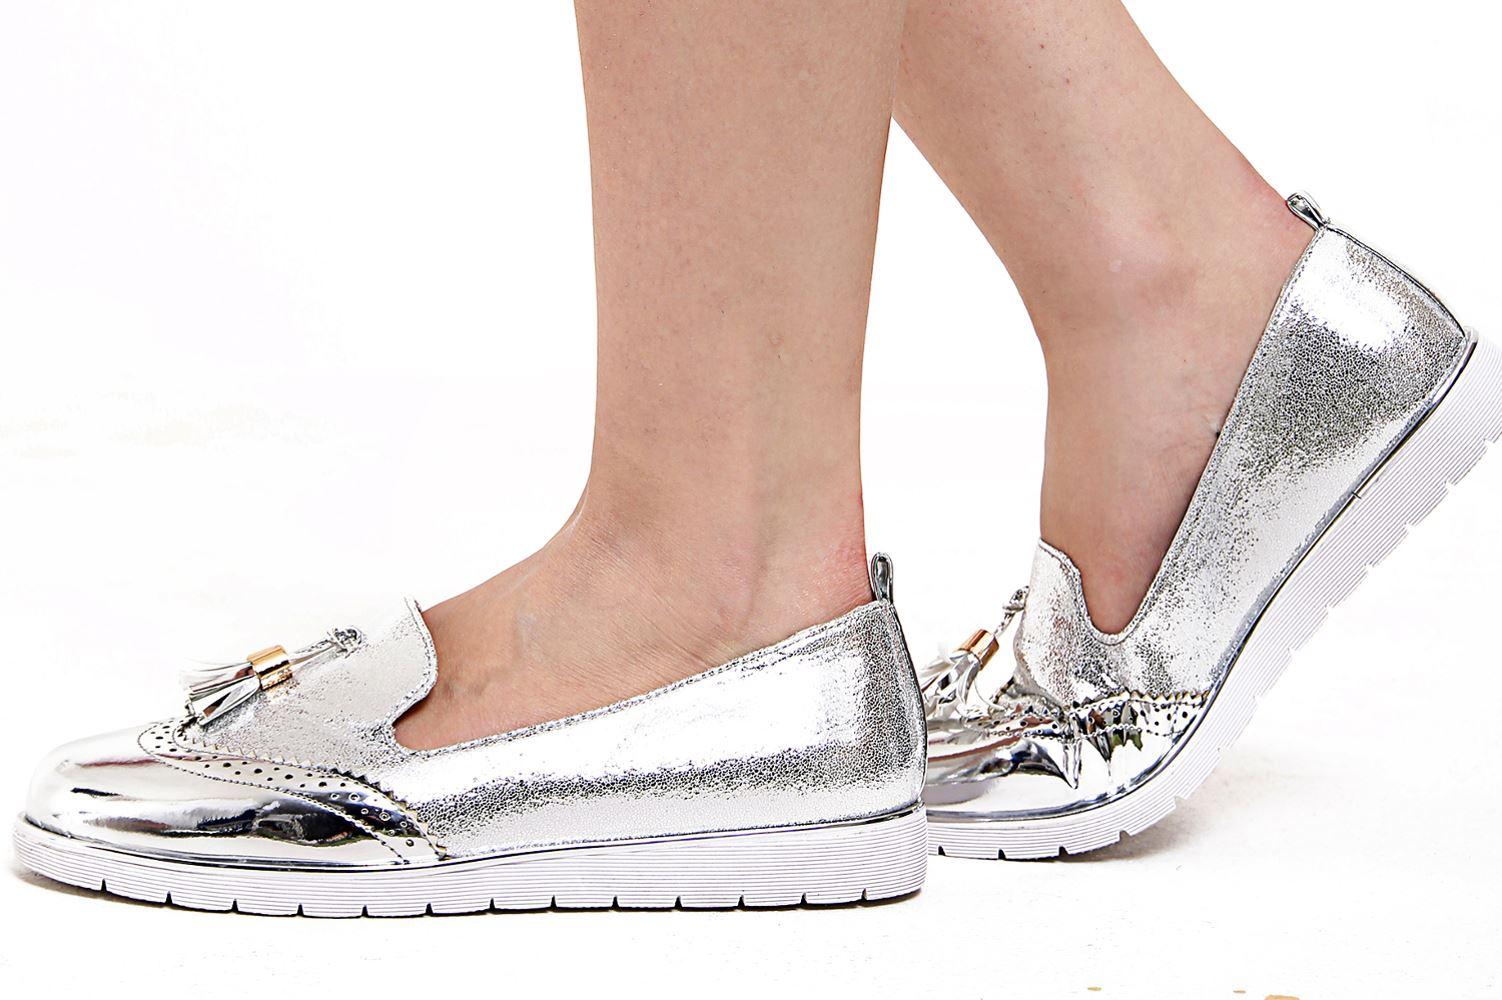 New Womens Low Wedge Heel Slip On Shimmer Tassled Metallic Hue Brogue Loafers